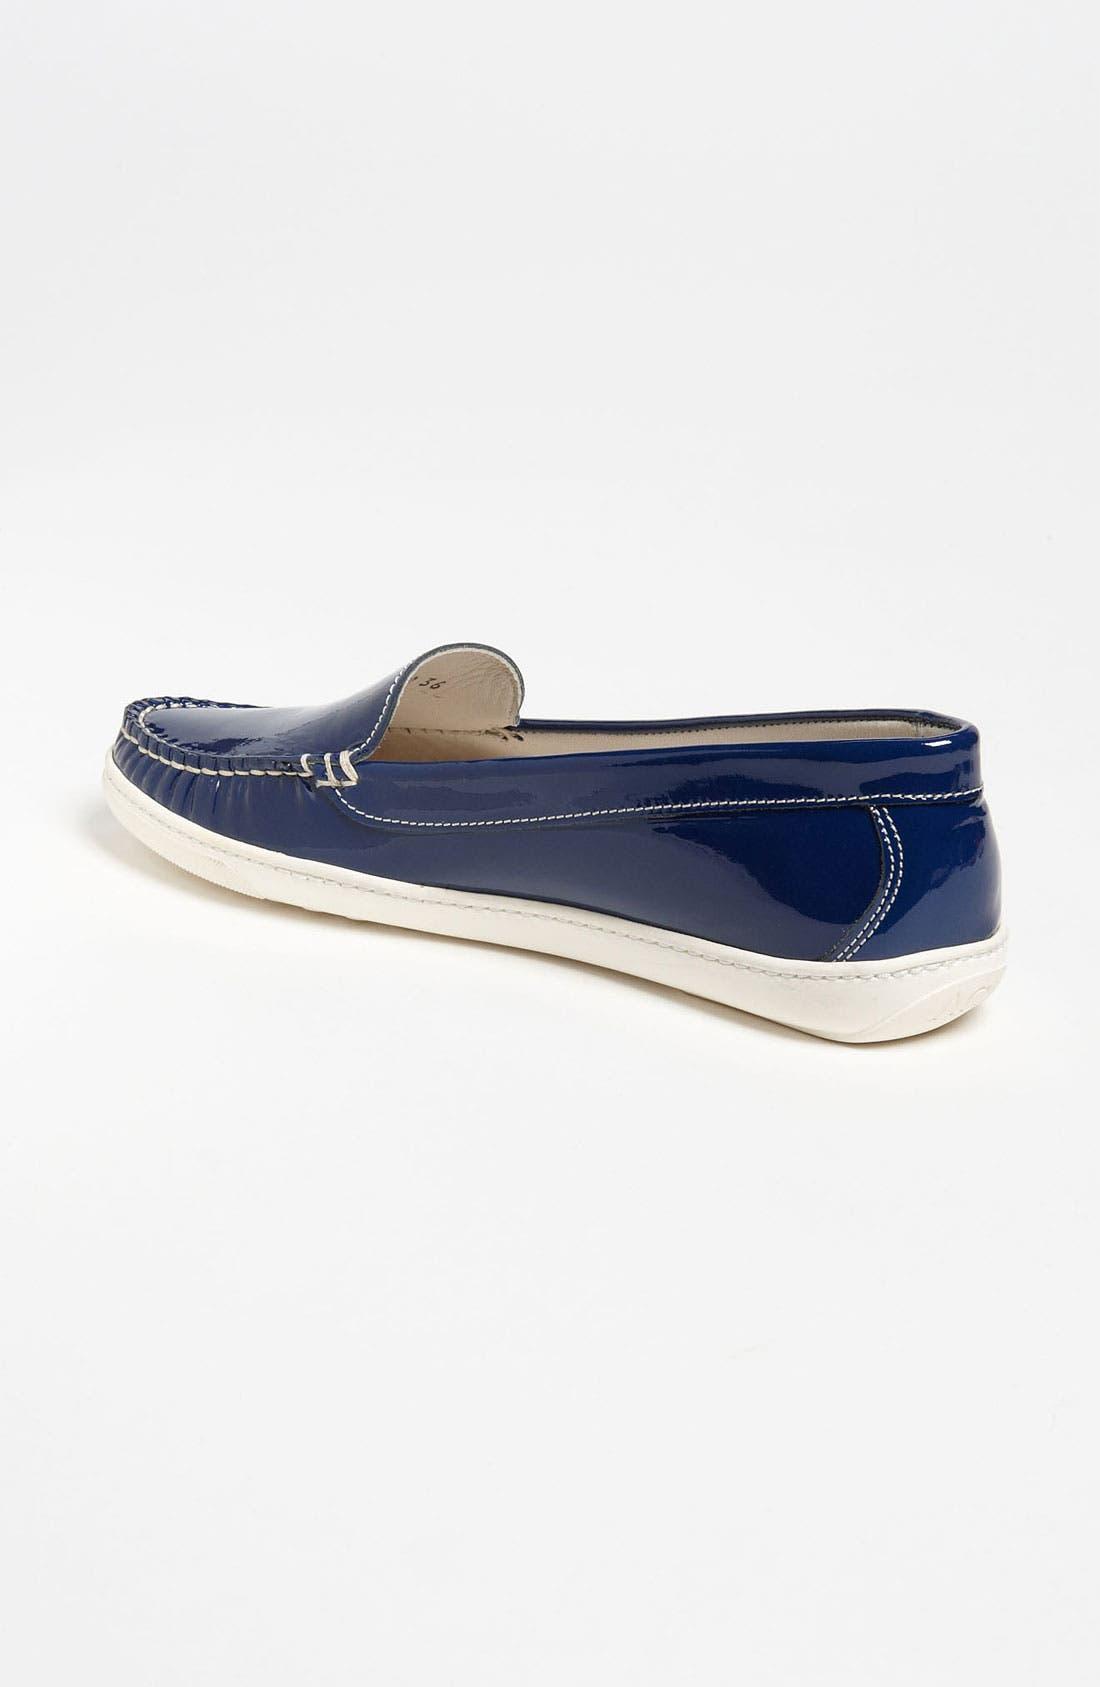 Alternate Image 2  - Attilio Giusti Leombruni 'Yacht' Shoe